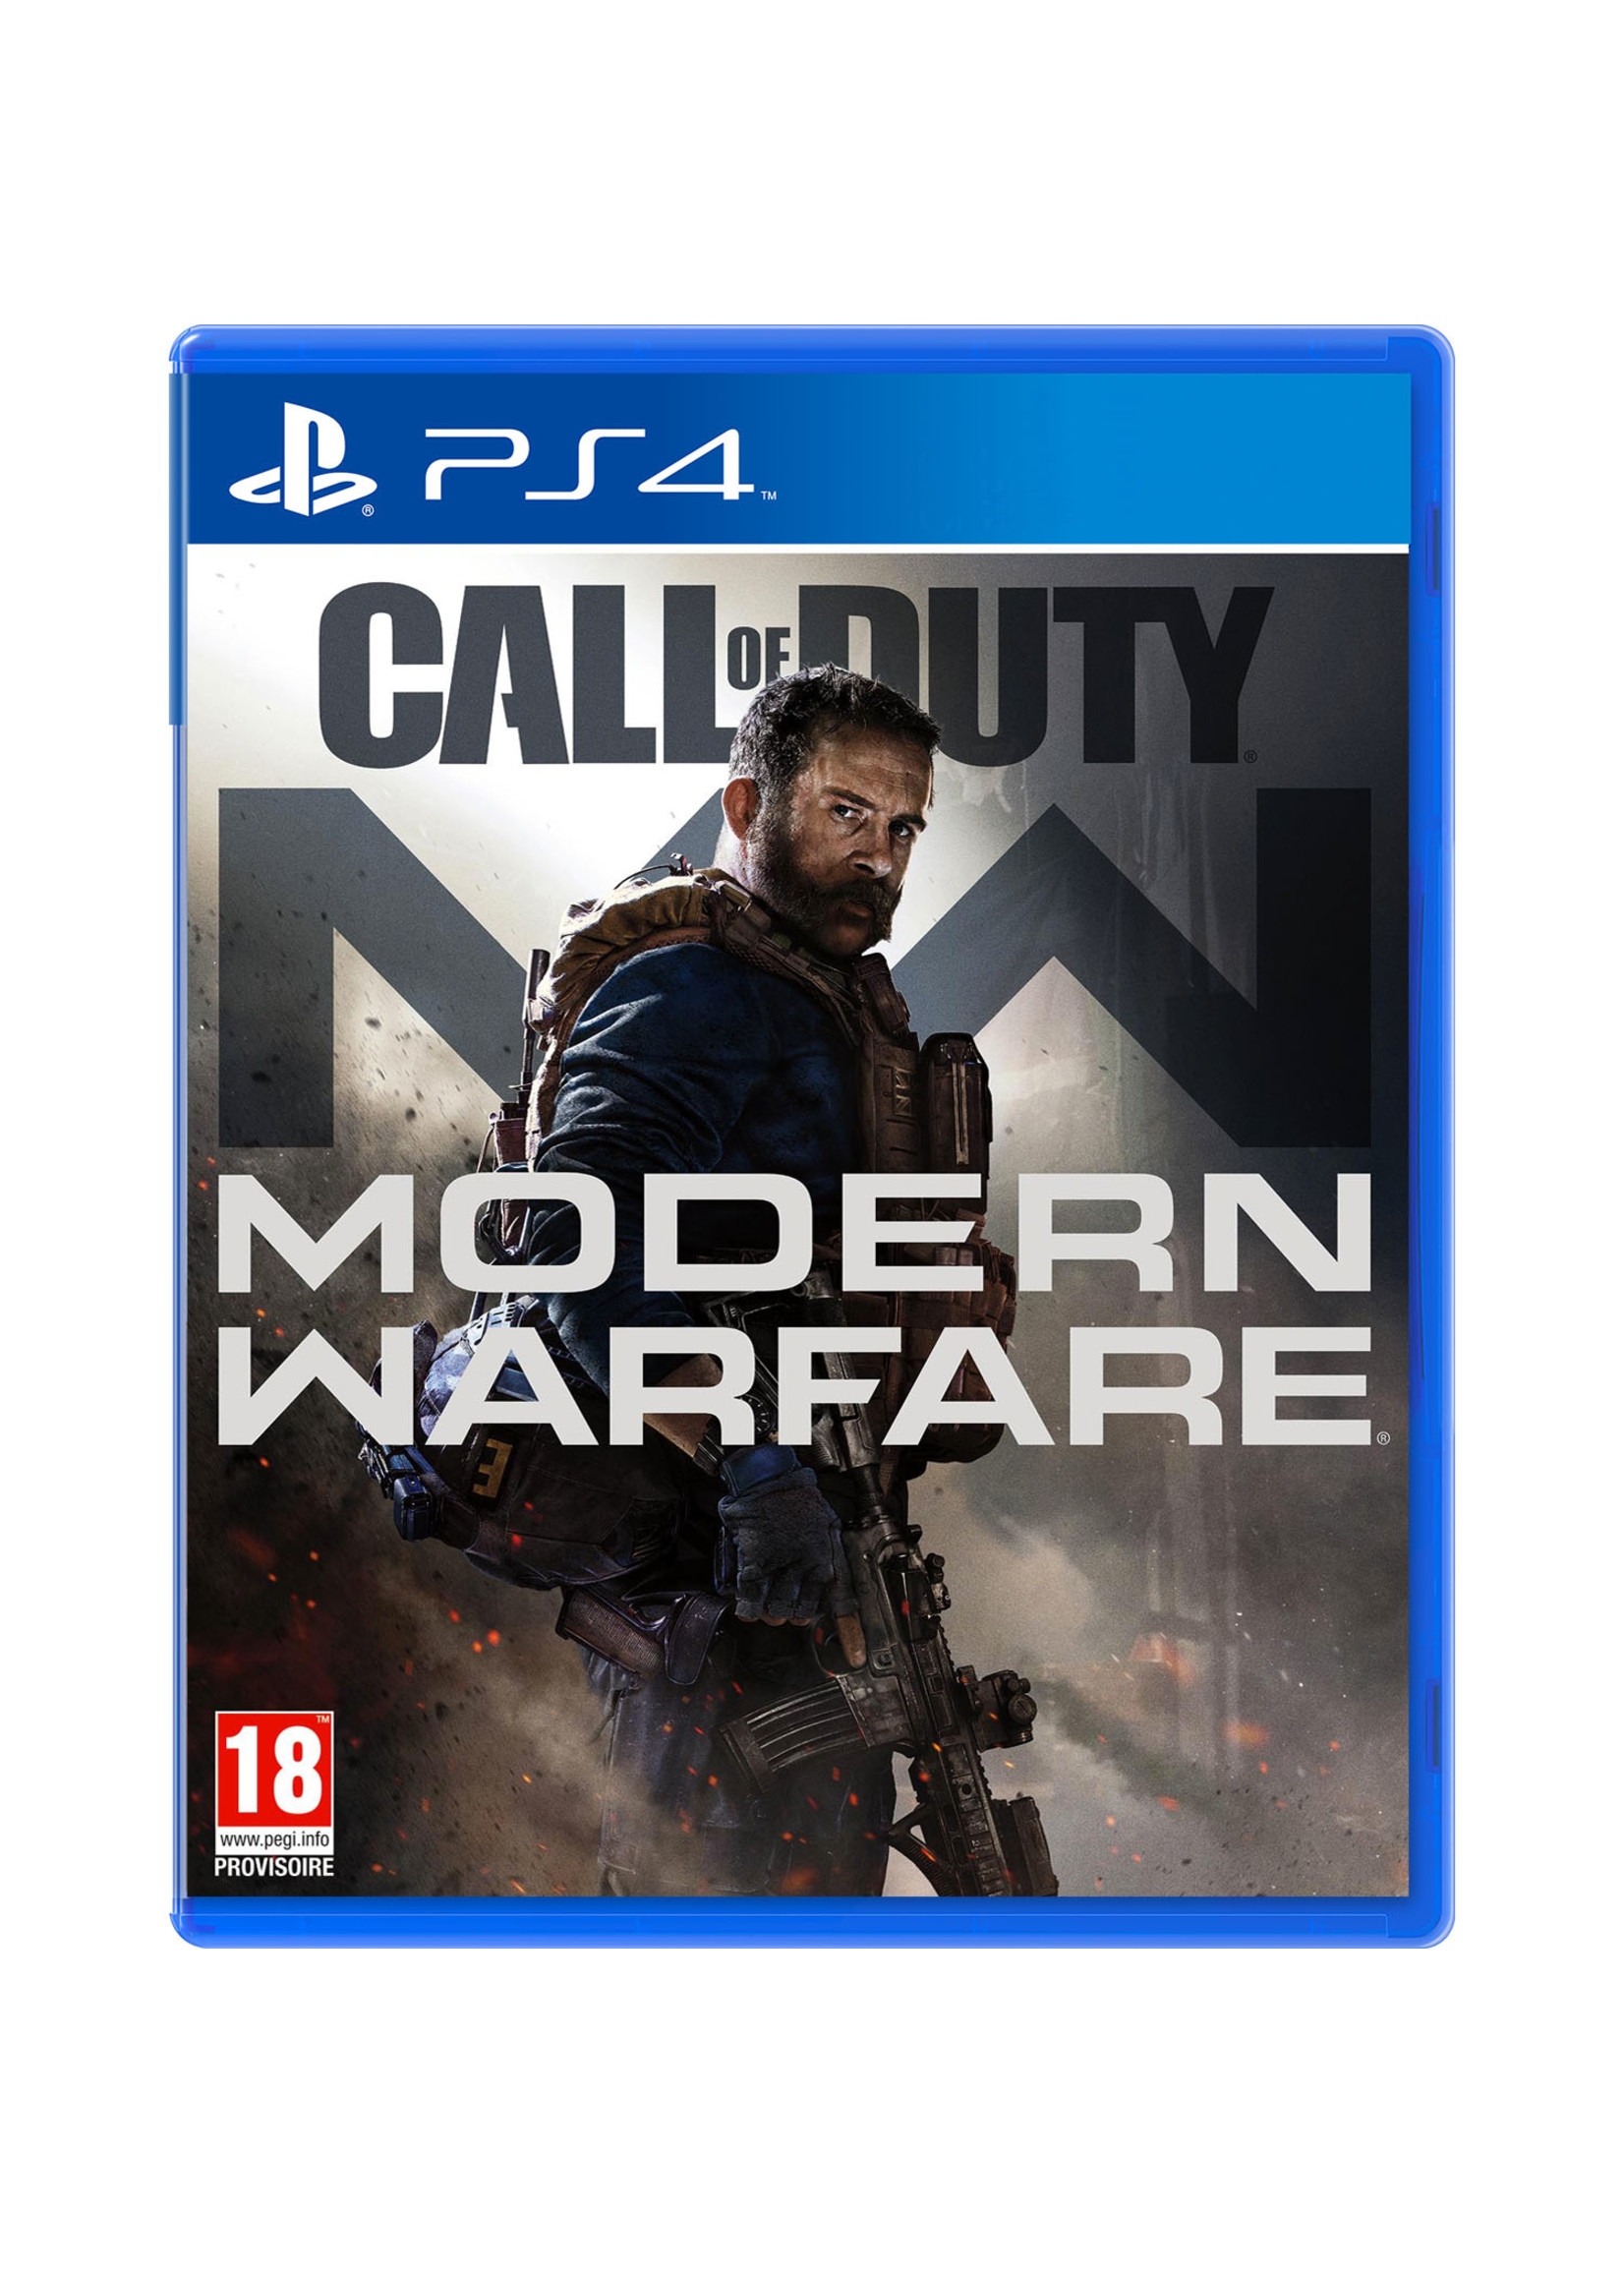 Call of Duty: Modern Warfare (2019) - PS4 NEW